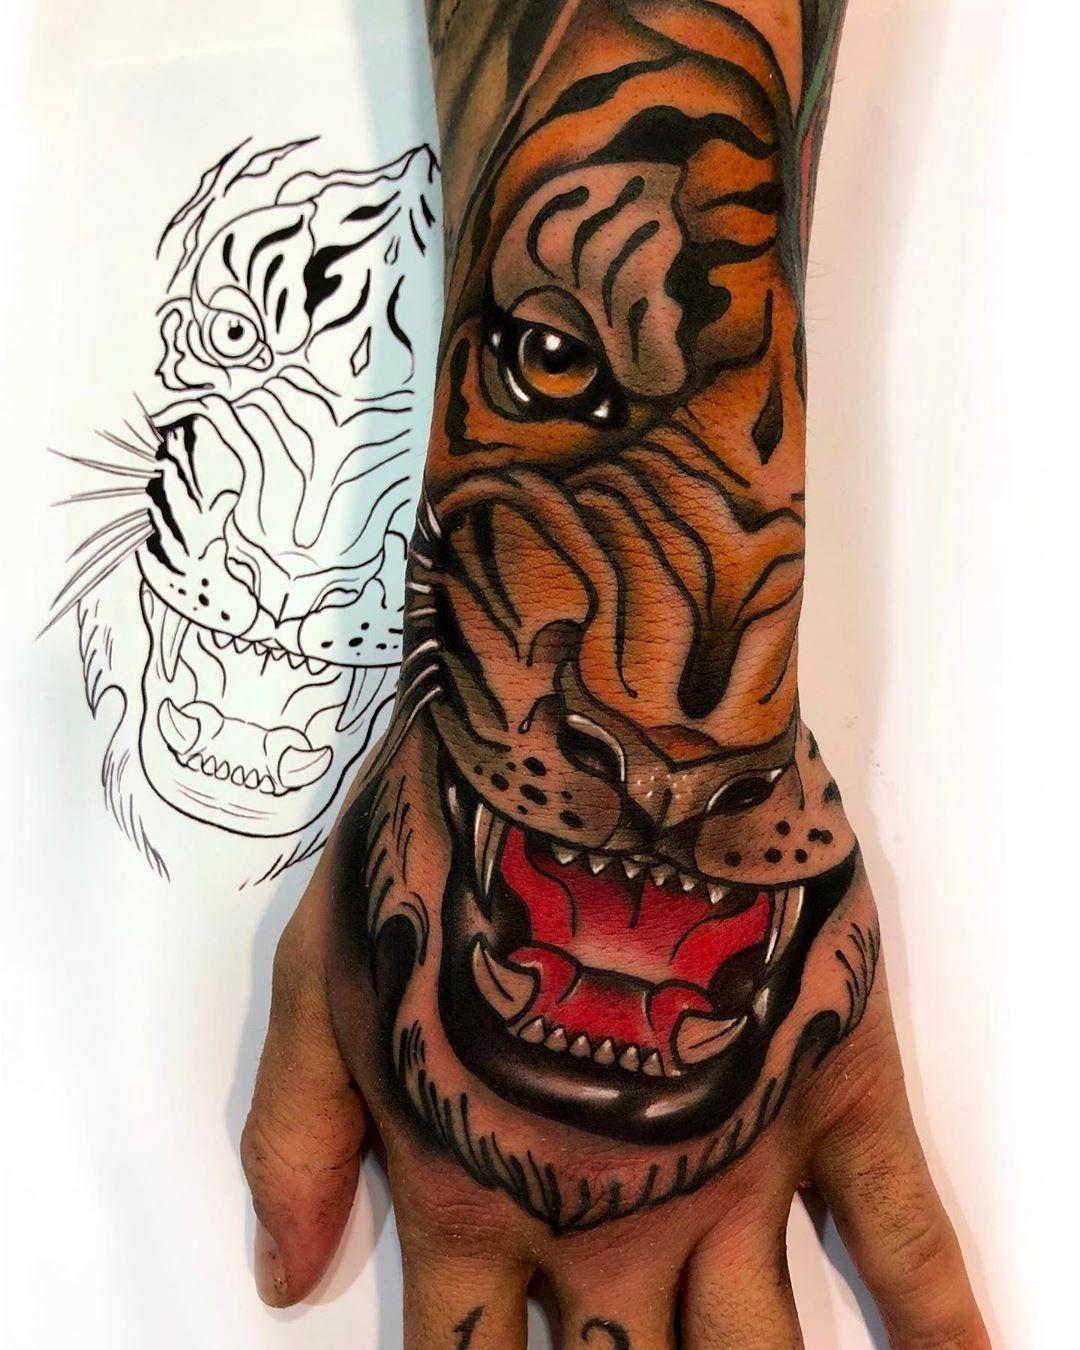 neotraditionaltattoo,followforfollow,puertollano,tattooers,besttattooers,juantabasco,ciudadrealsetatua,ink,tatuajes,realismo,realistictattoo,ciudadrealtattoo,tatuajesenpuertollano,traditionaltattoos,castillalamancha,ink,tattooart,zurichtattoo,daimiel,inkedgirls,inkig,ink,inktattoos